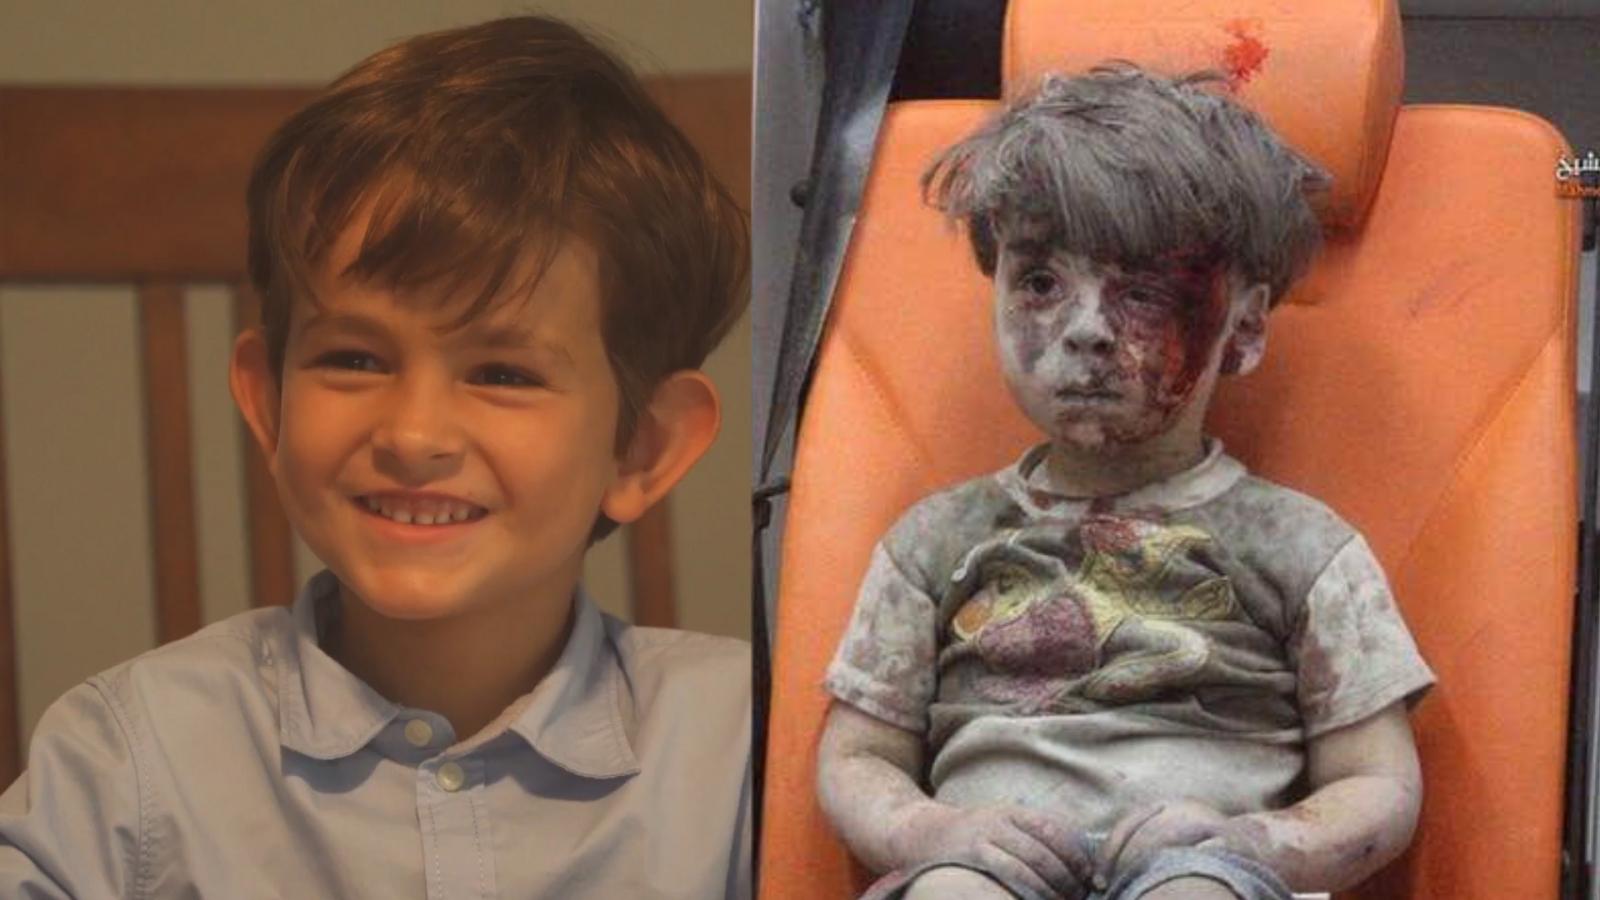 Bring omran daqneesh to the us pleads 6 year old boy to obama ccuart Choice Image